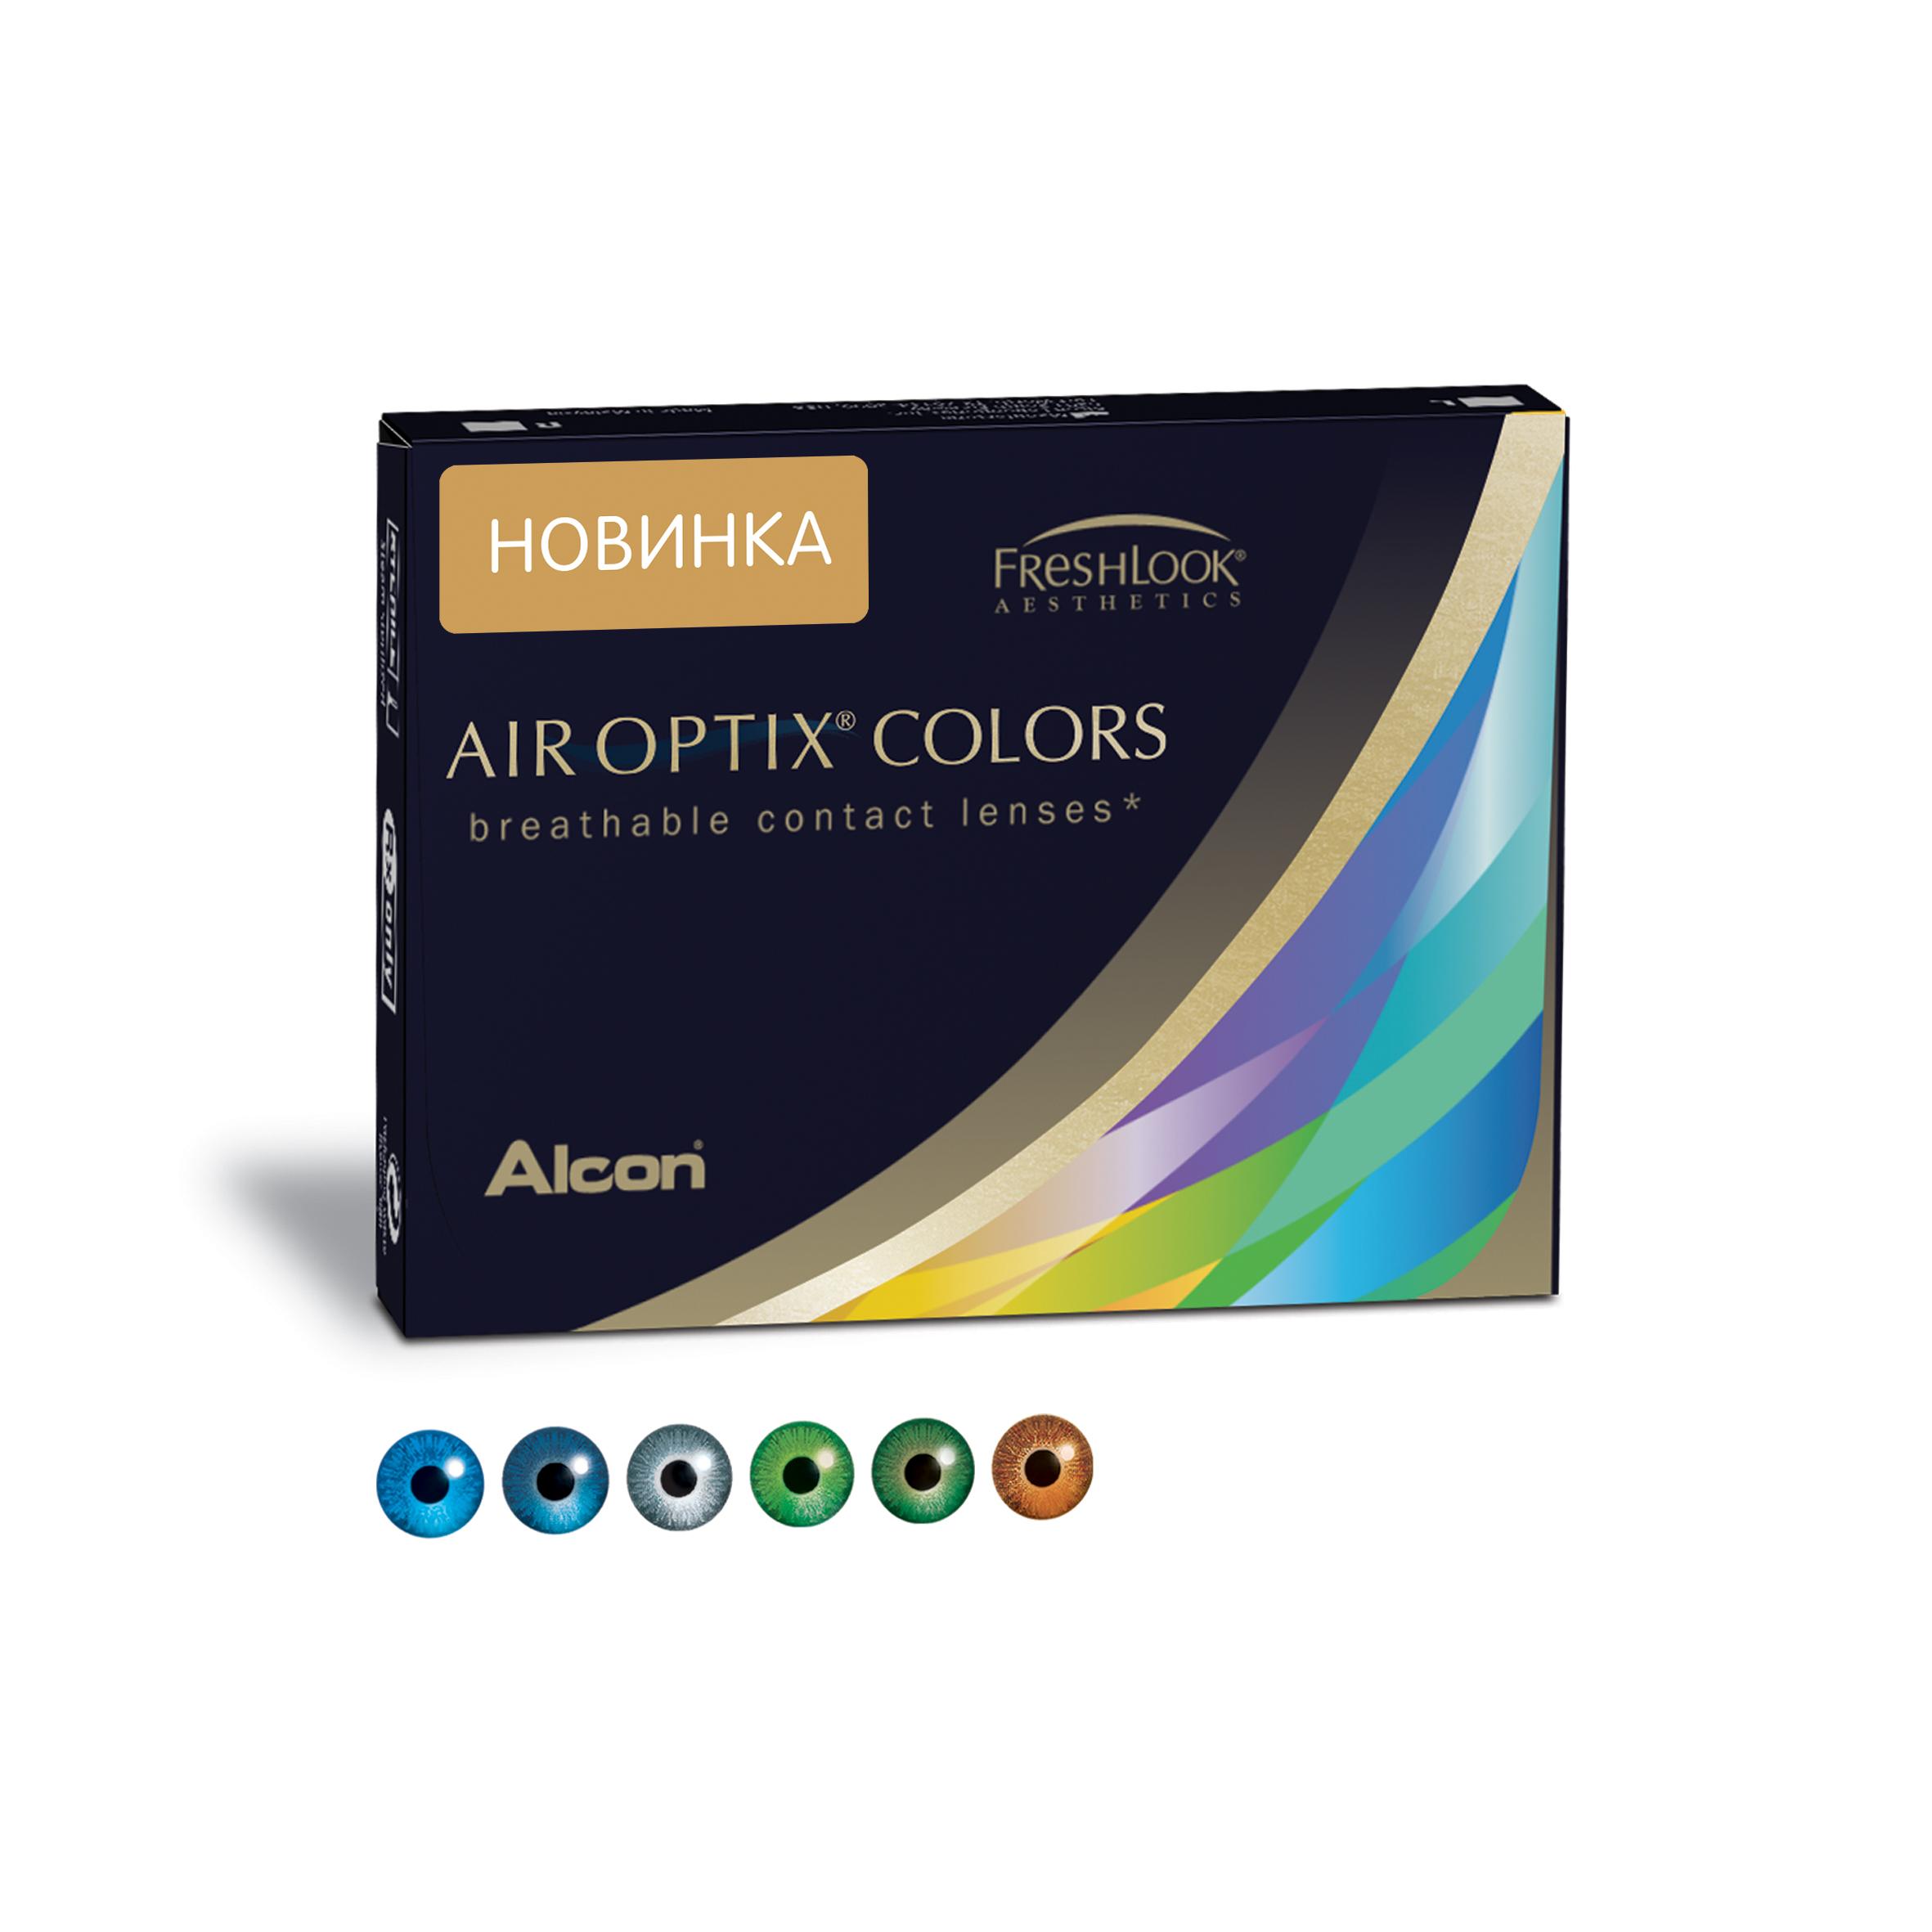 Аlcon контактные линзы Air Optix Colors 2 шт -5.25 Gemstone Green31746277Мягкие контактные линзы